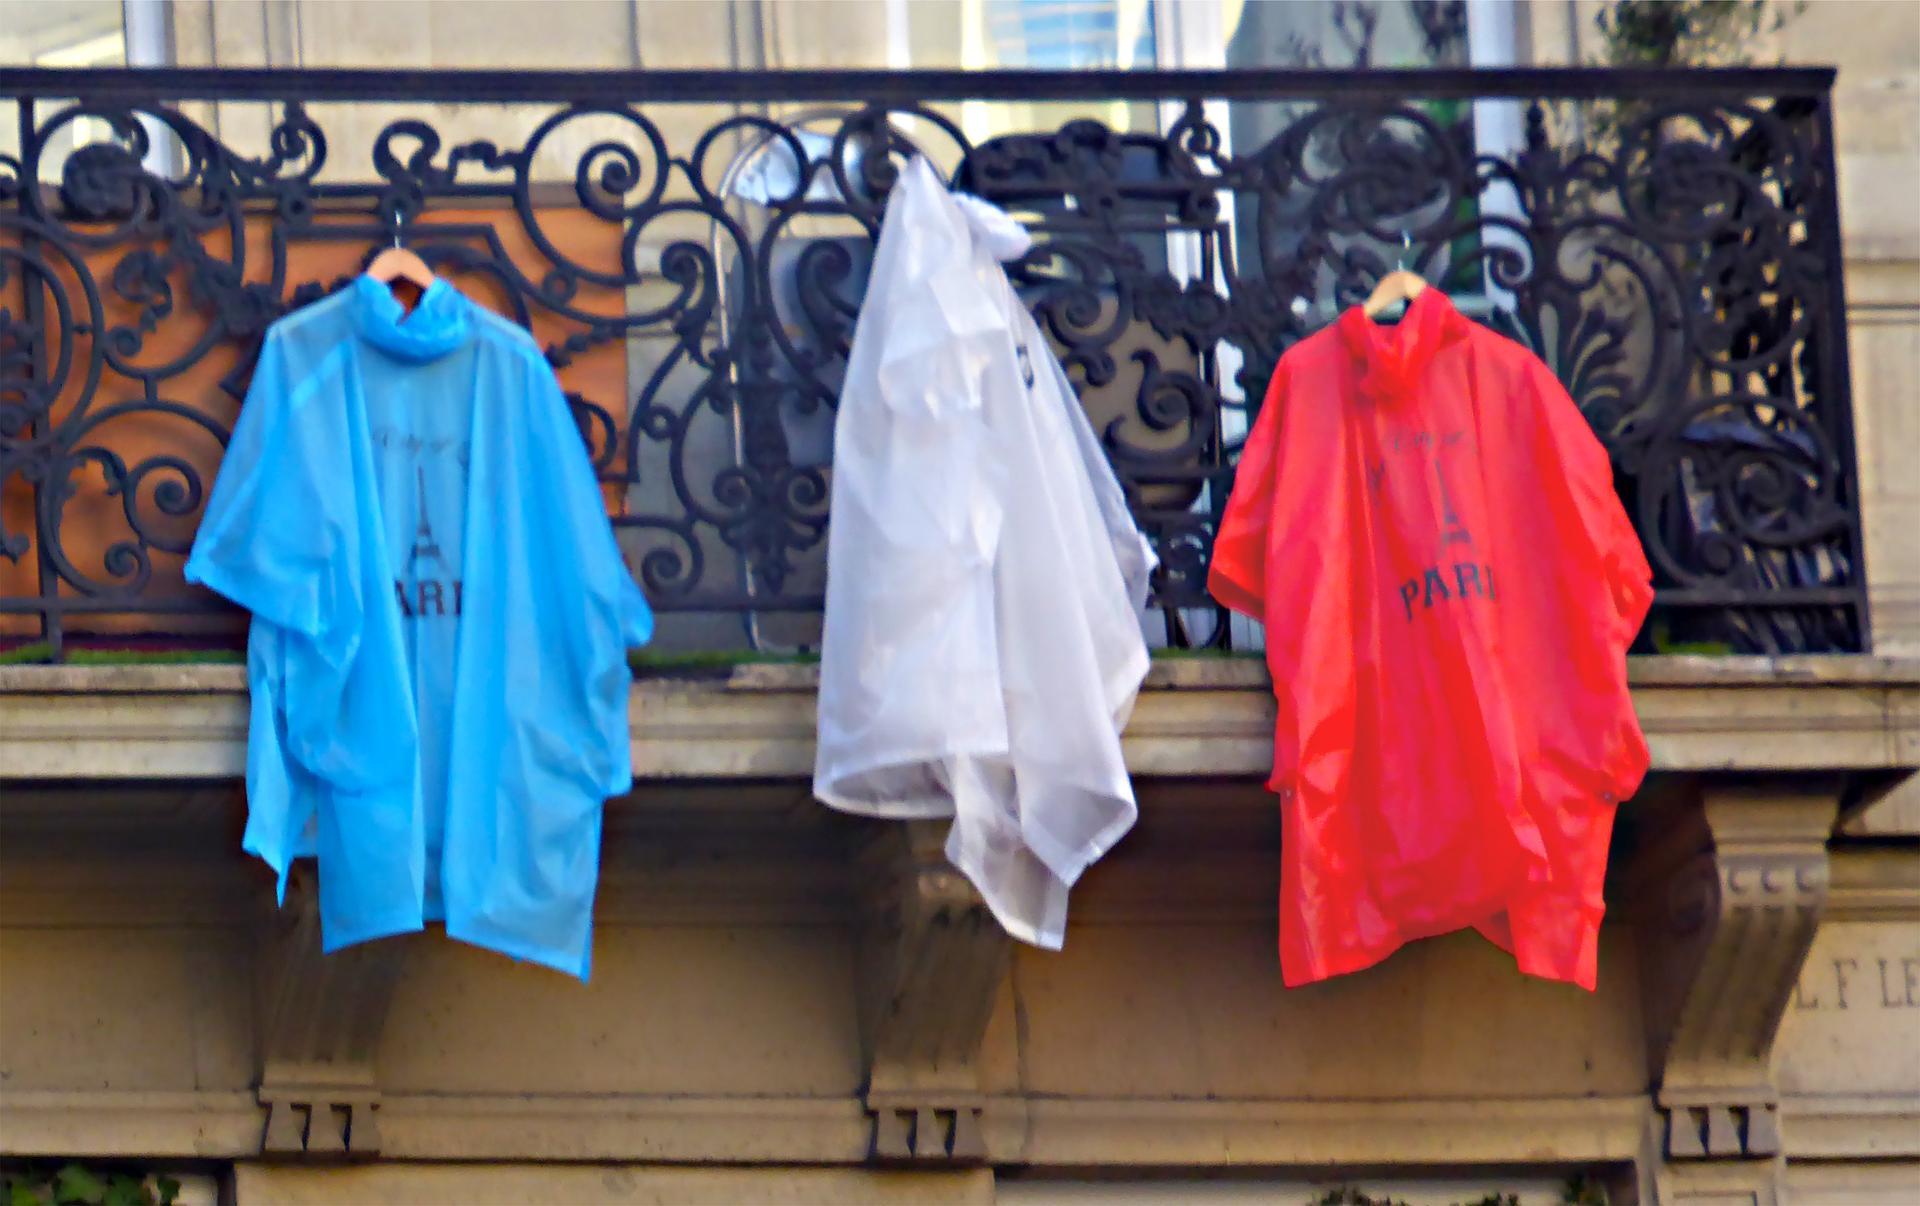 Bons baisers from Paris